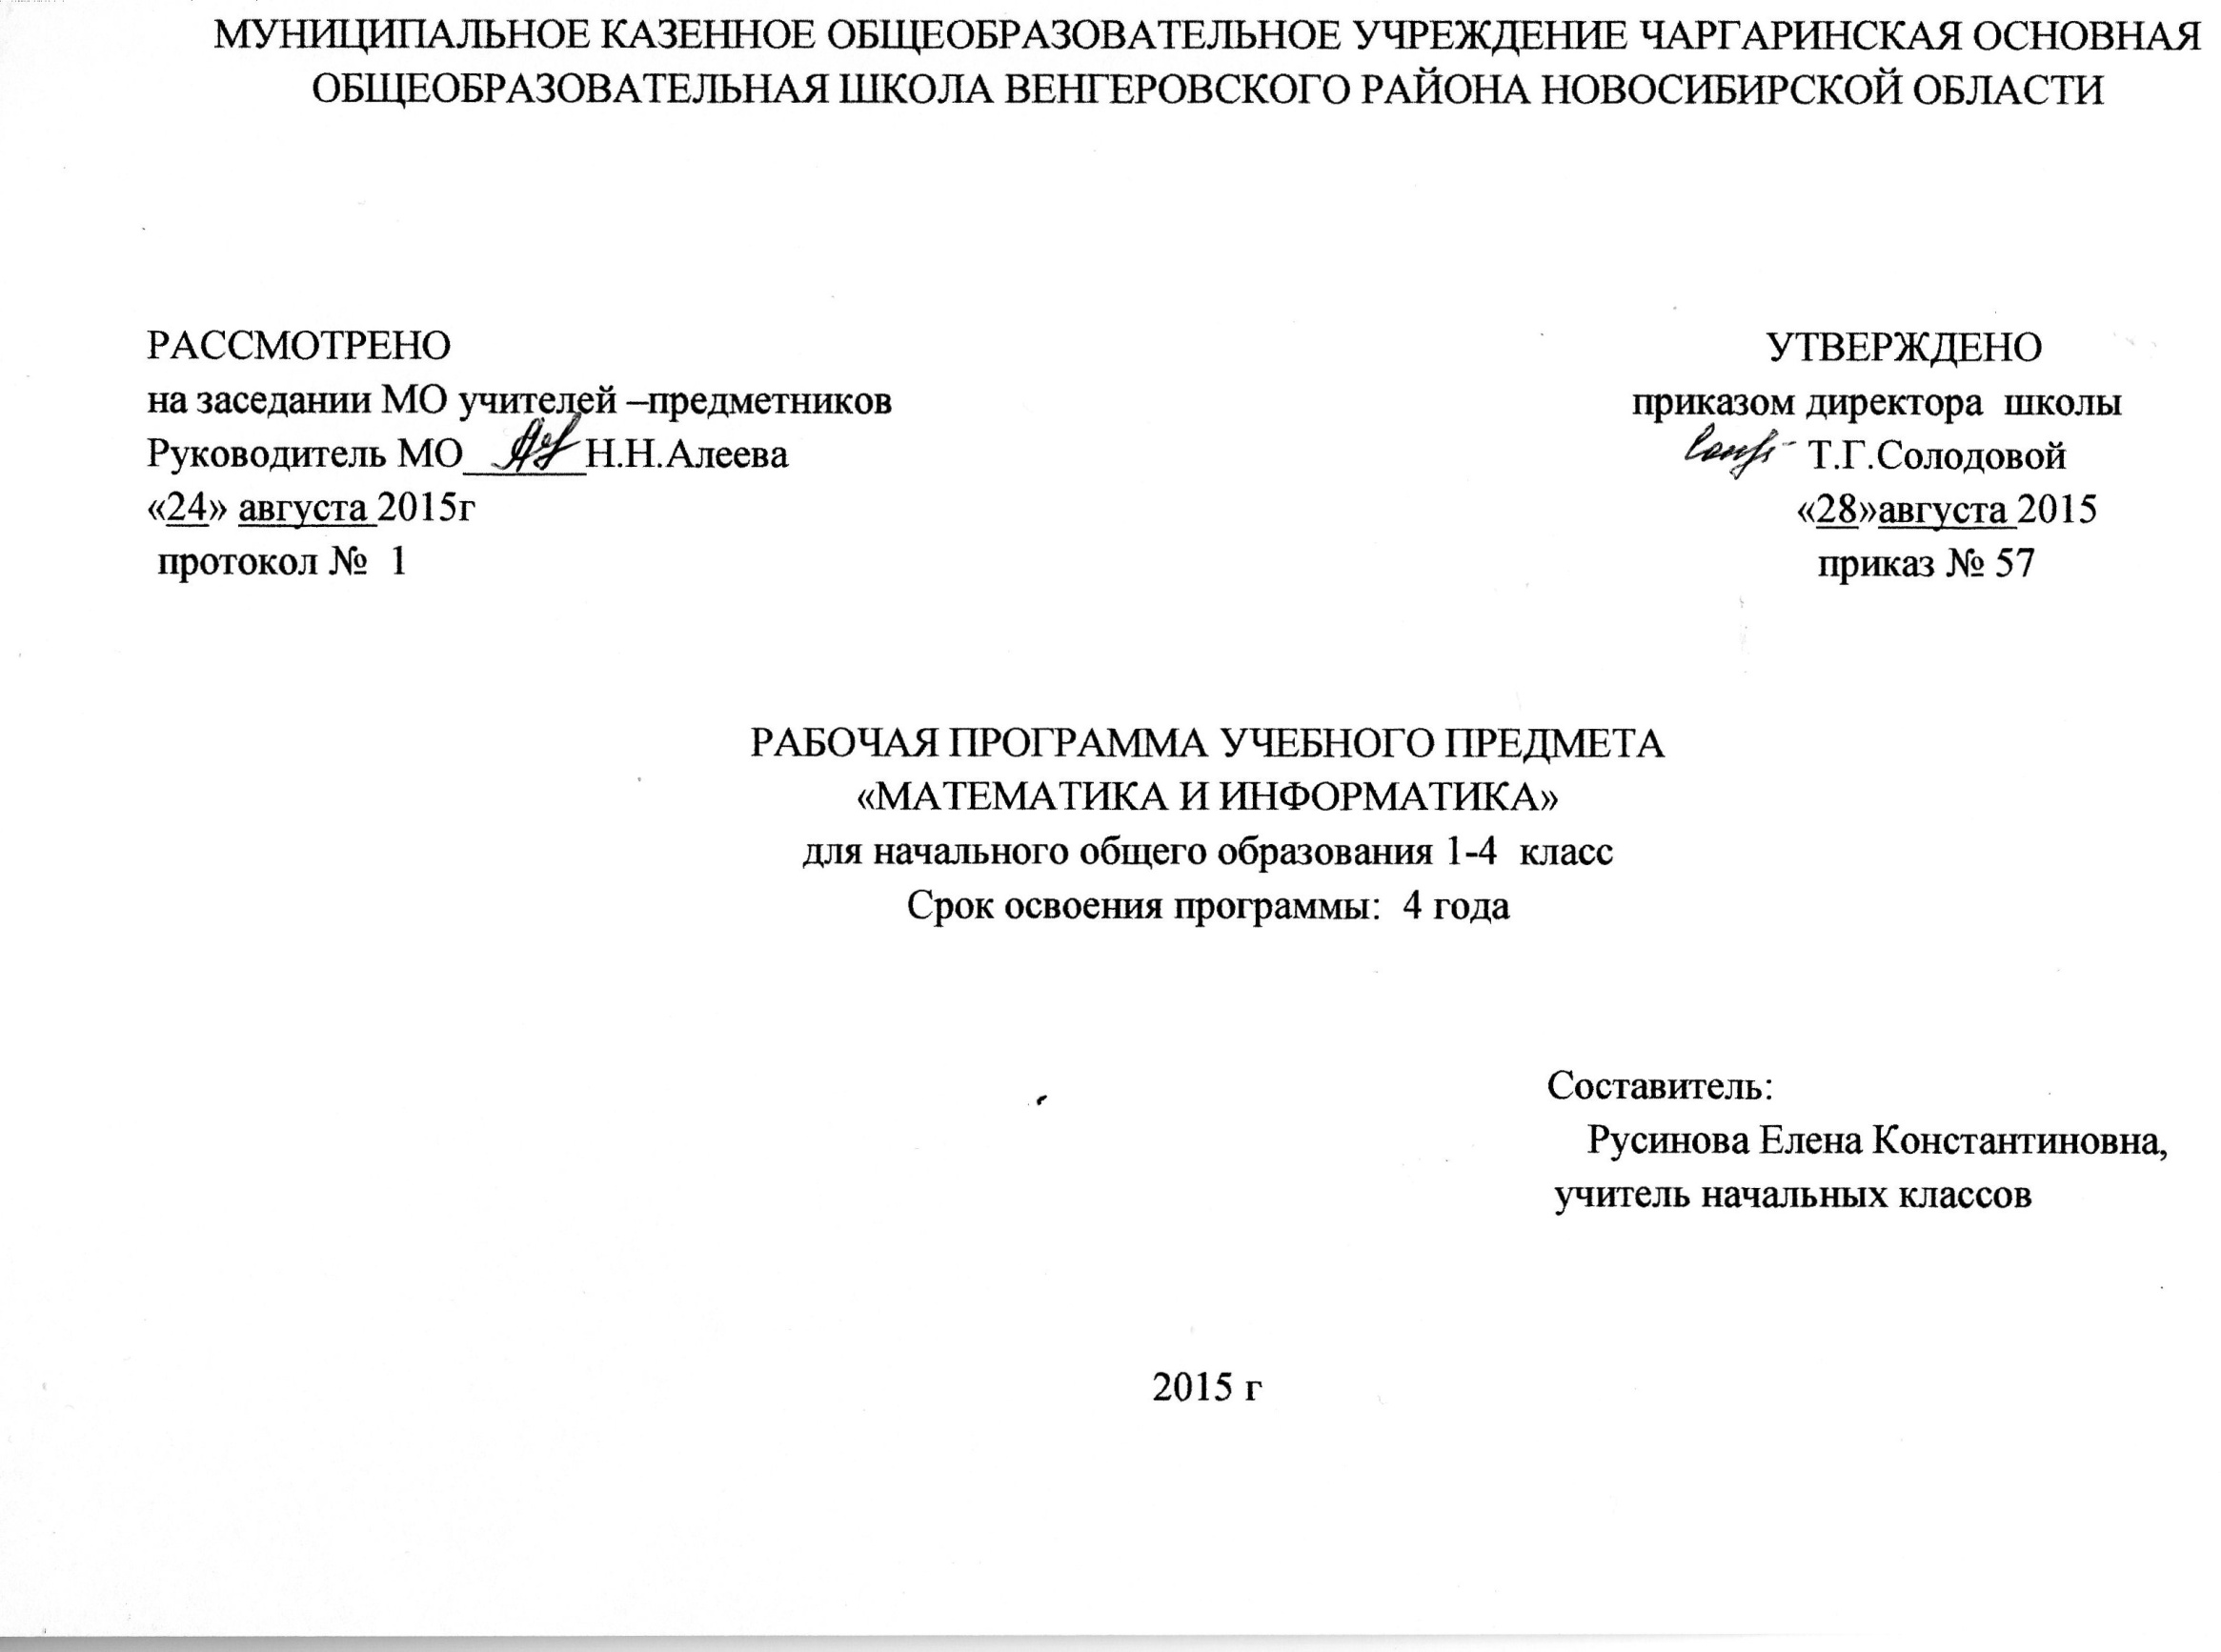 C:\Documents and Settings\Admin\Рабочий стол\img186.jpg